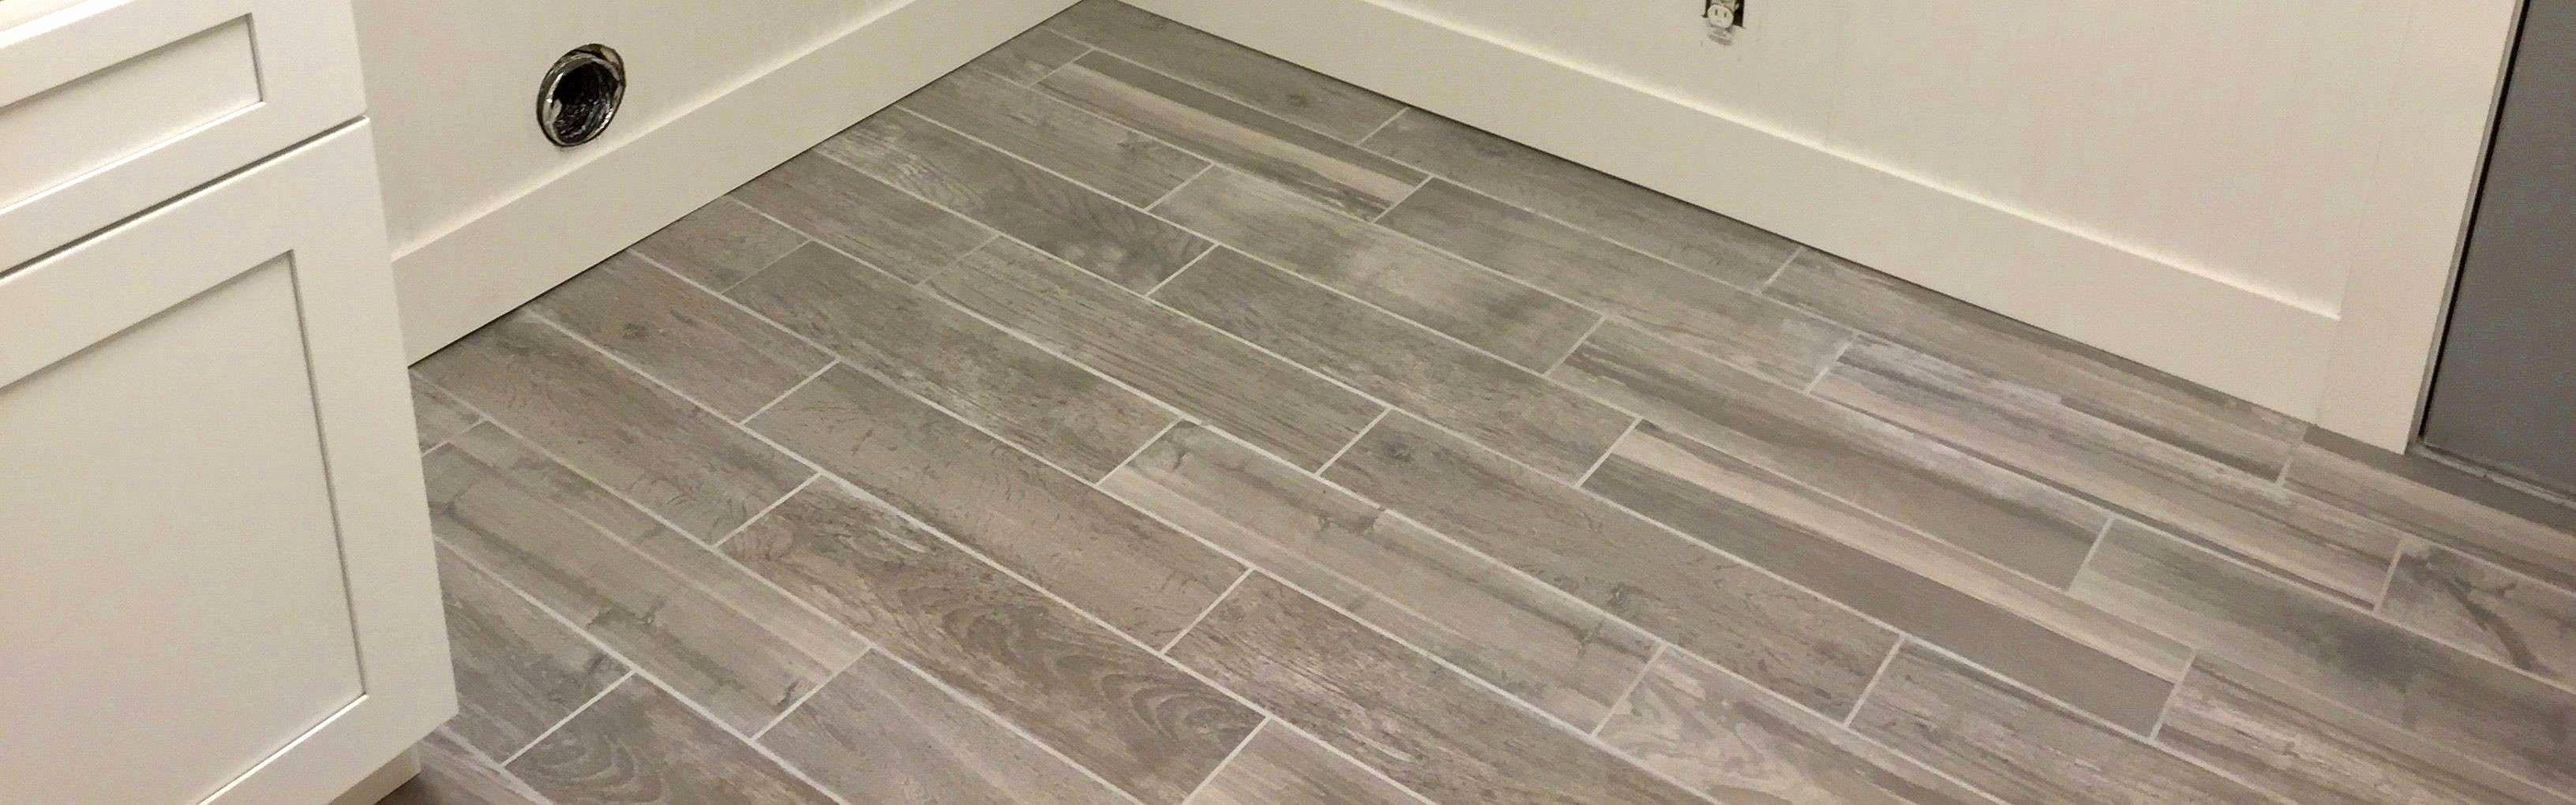 hardwood floor cleaning columbus ohio of carpet contractors ppt template business refrence calendar pertaining to carpet contractors 50 new hardwood flooring contractors graphics 50 s